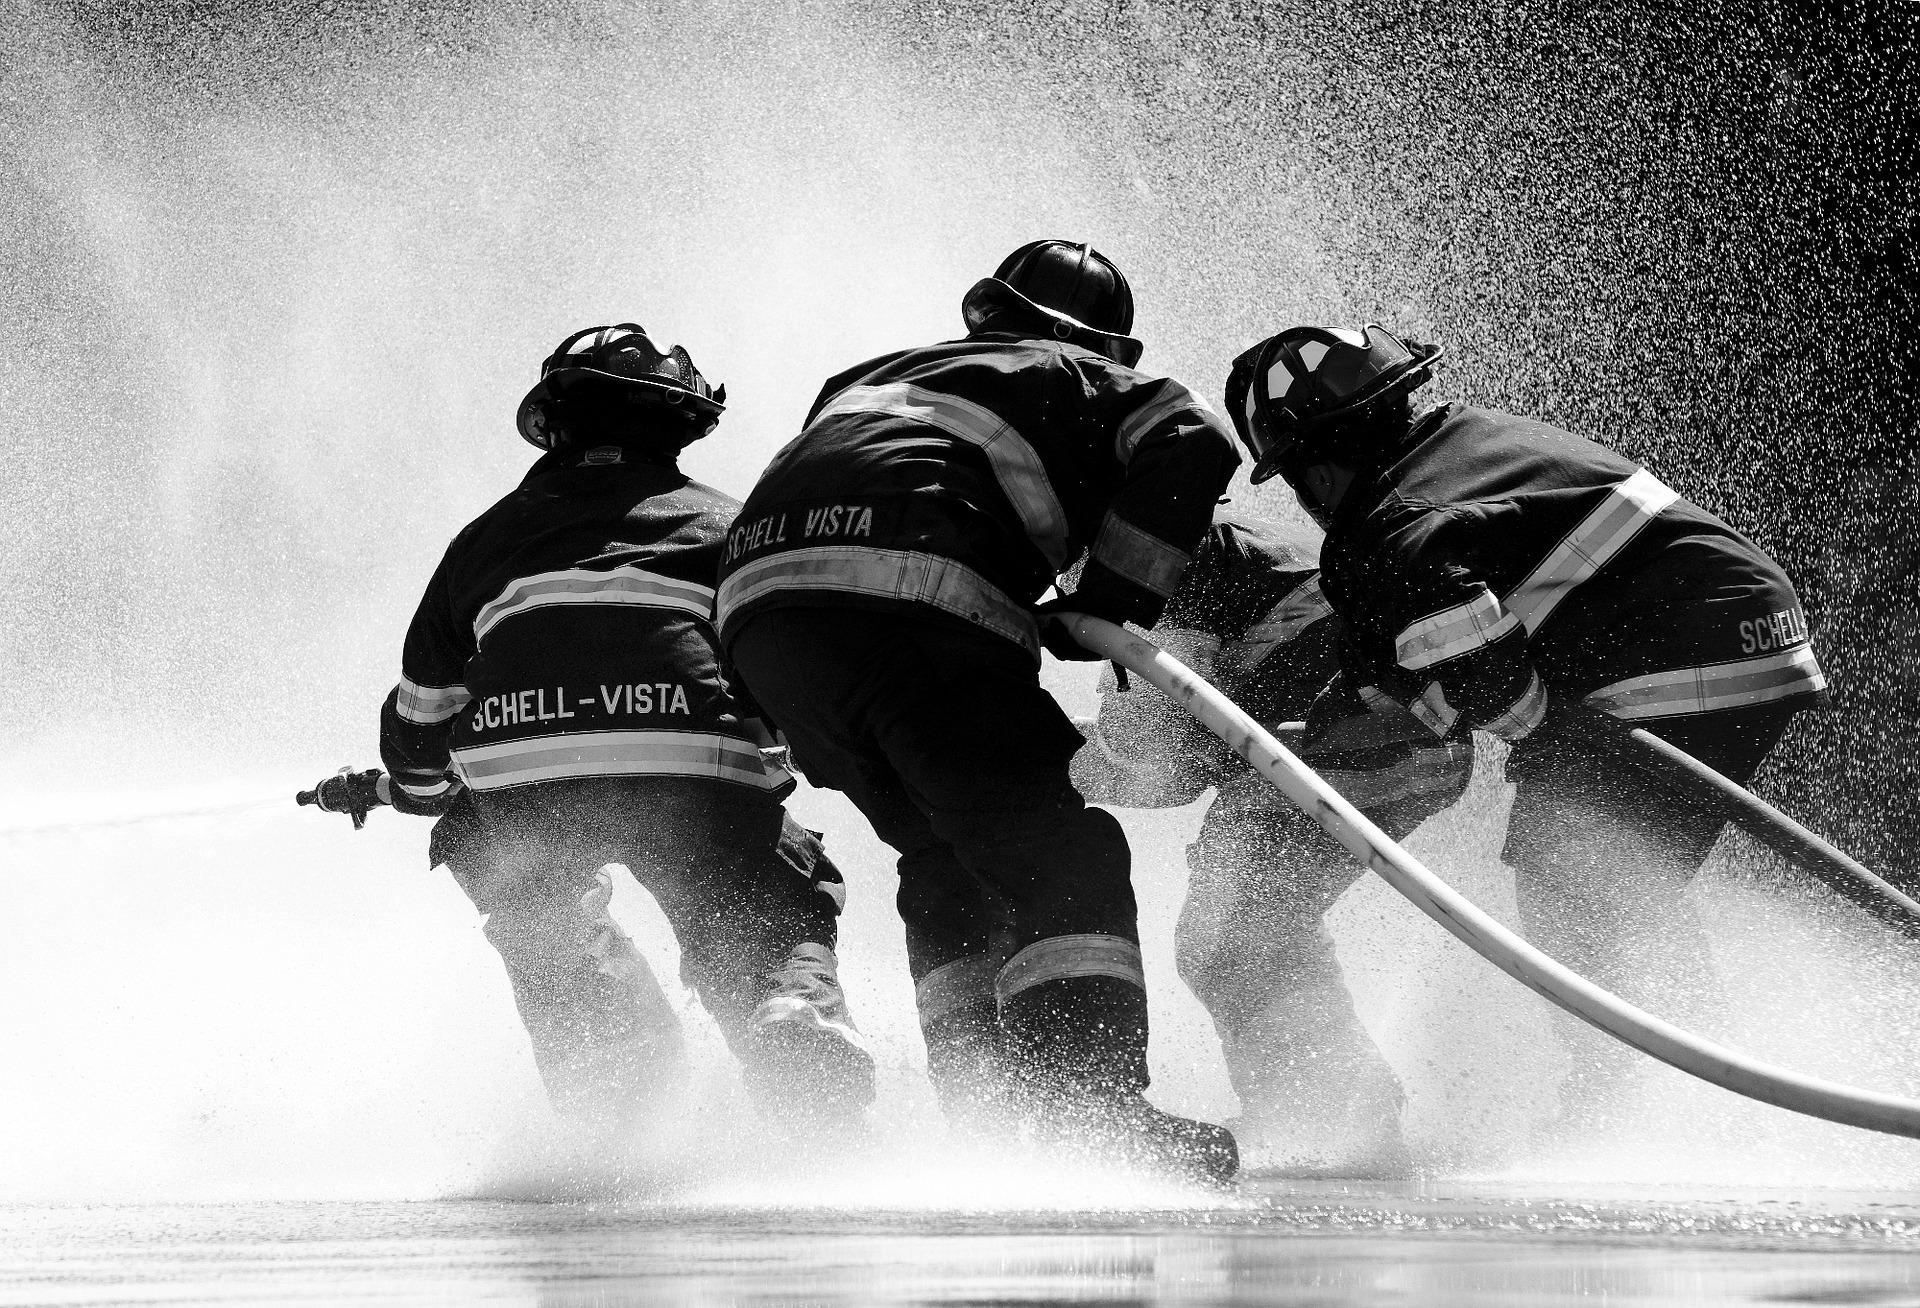 MN Firefighter